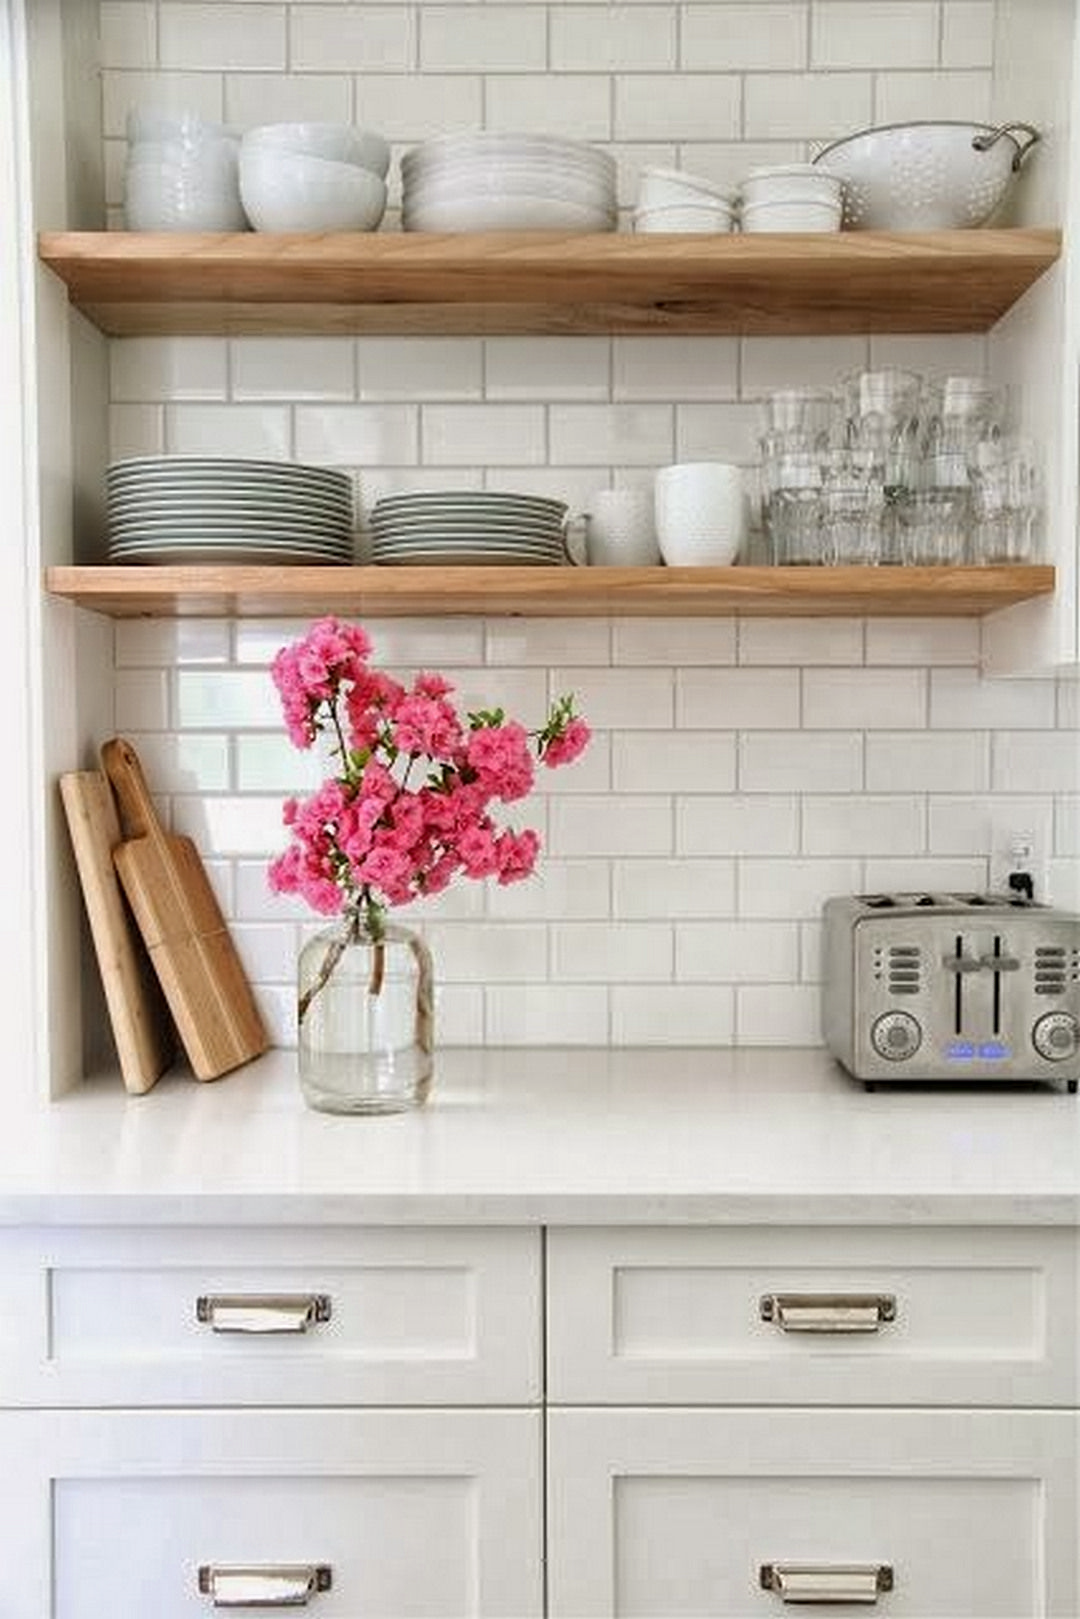 28 Nice Open Shelving Ideas for Minimalist Interior | Open shelving Tiny Kitchen Ideas Quartz Html on